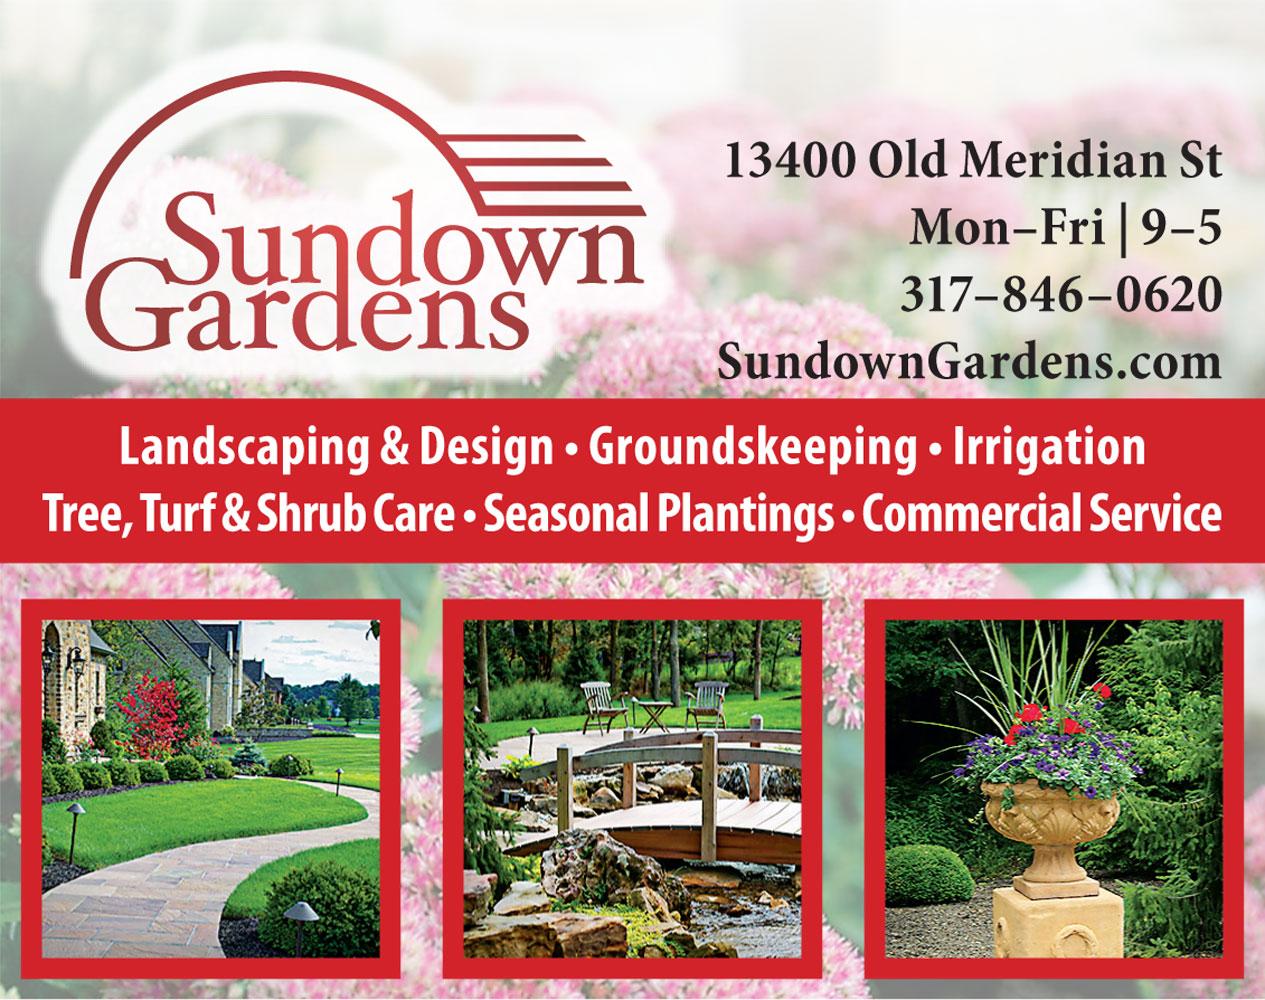 Sundown Gardens